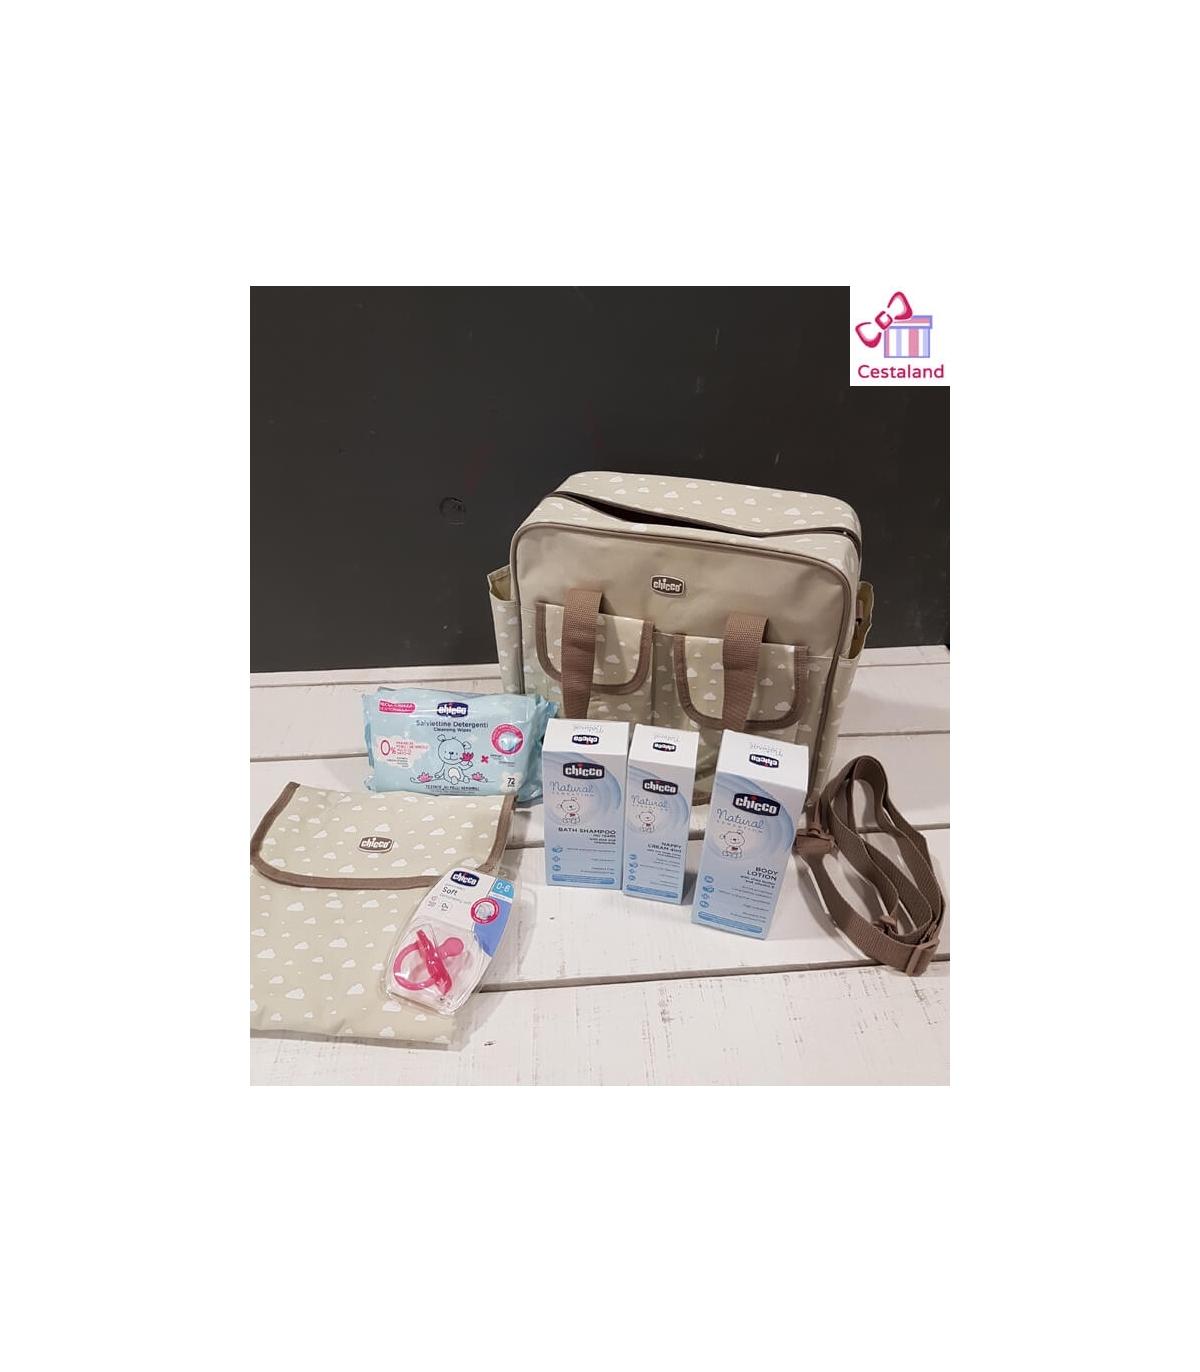 92baef245 Bolsa maternal CHICCO estrellas. Completa bolsa para la maternidad.